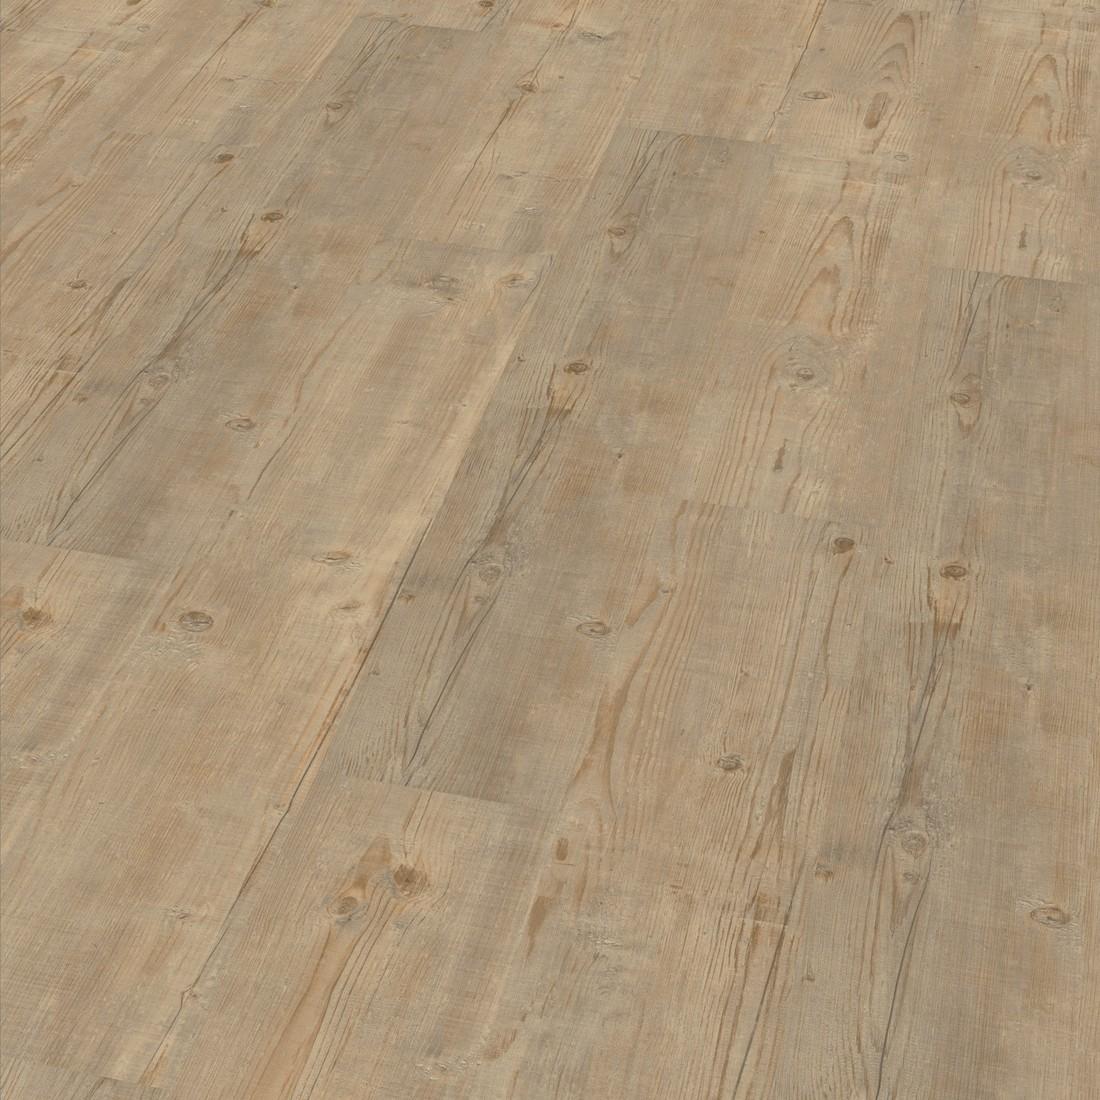 wineo klick vinyl ambra wood dekor lohas greige designboden feuchtraumgeeignet vinyl wineo vinyl. Black Bedroom Furniture Sets. Home Design Ideas